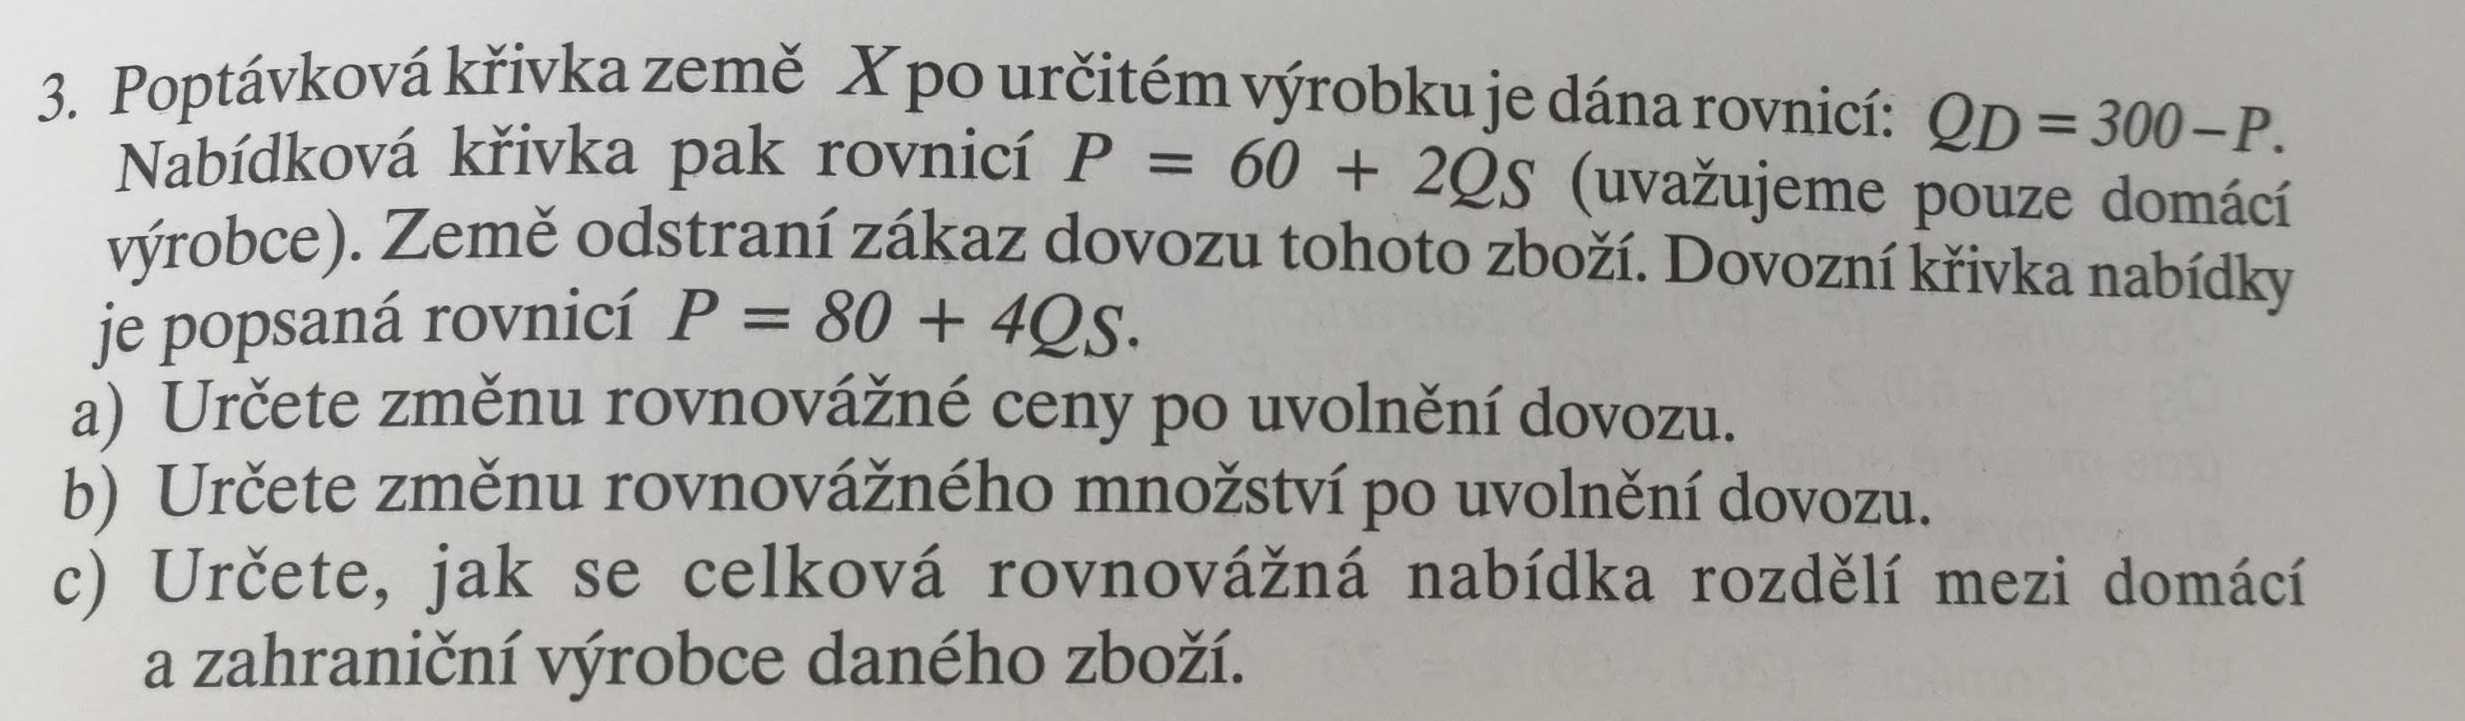 http://forum.matematika.cz/upload3/img/2019-03/79083_IMG_20190312_092140.jpg